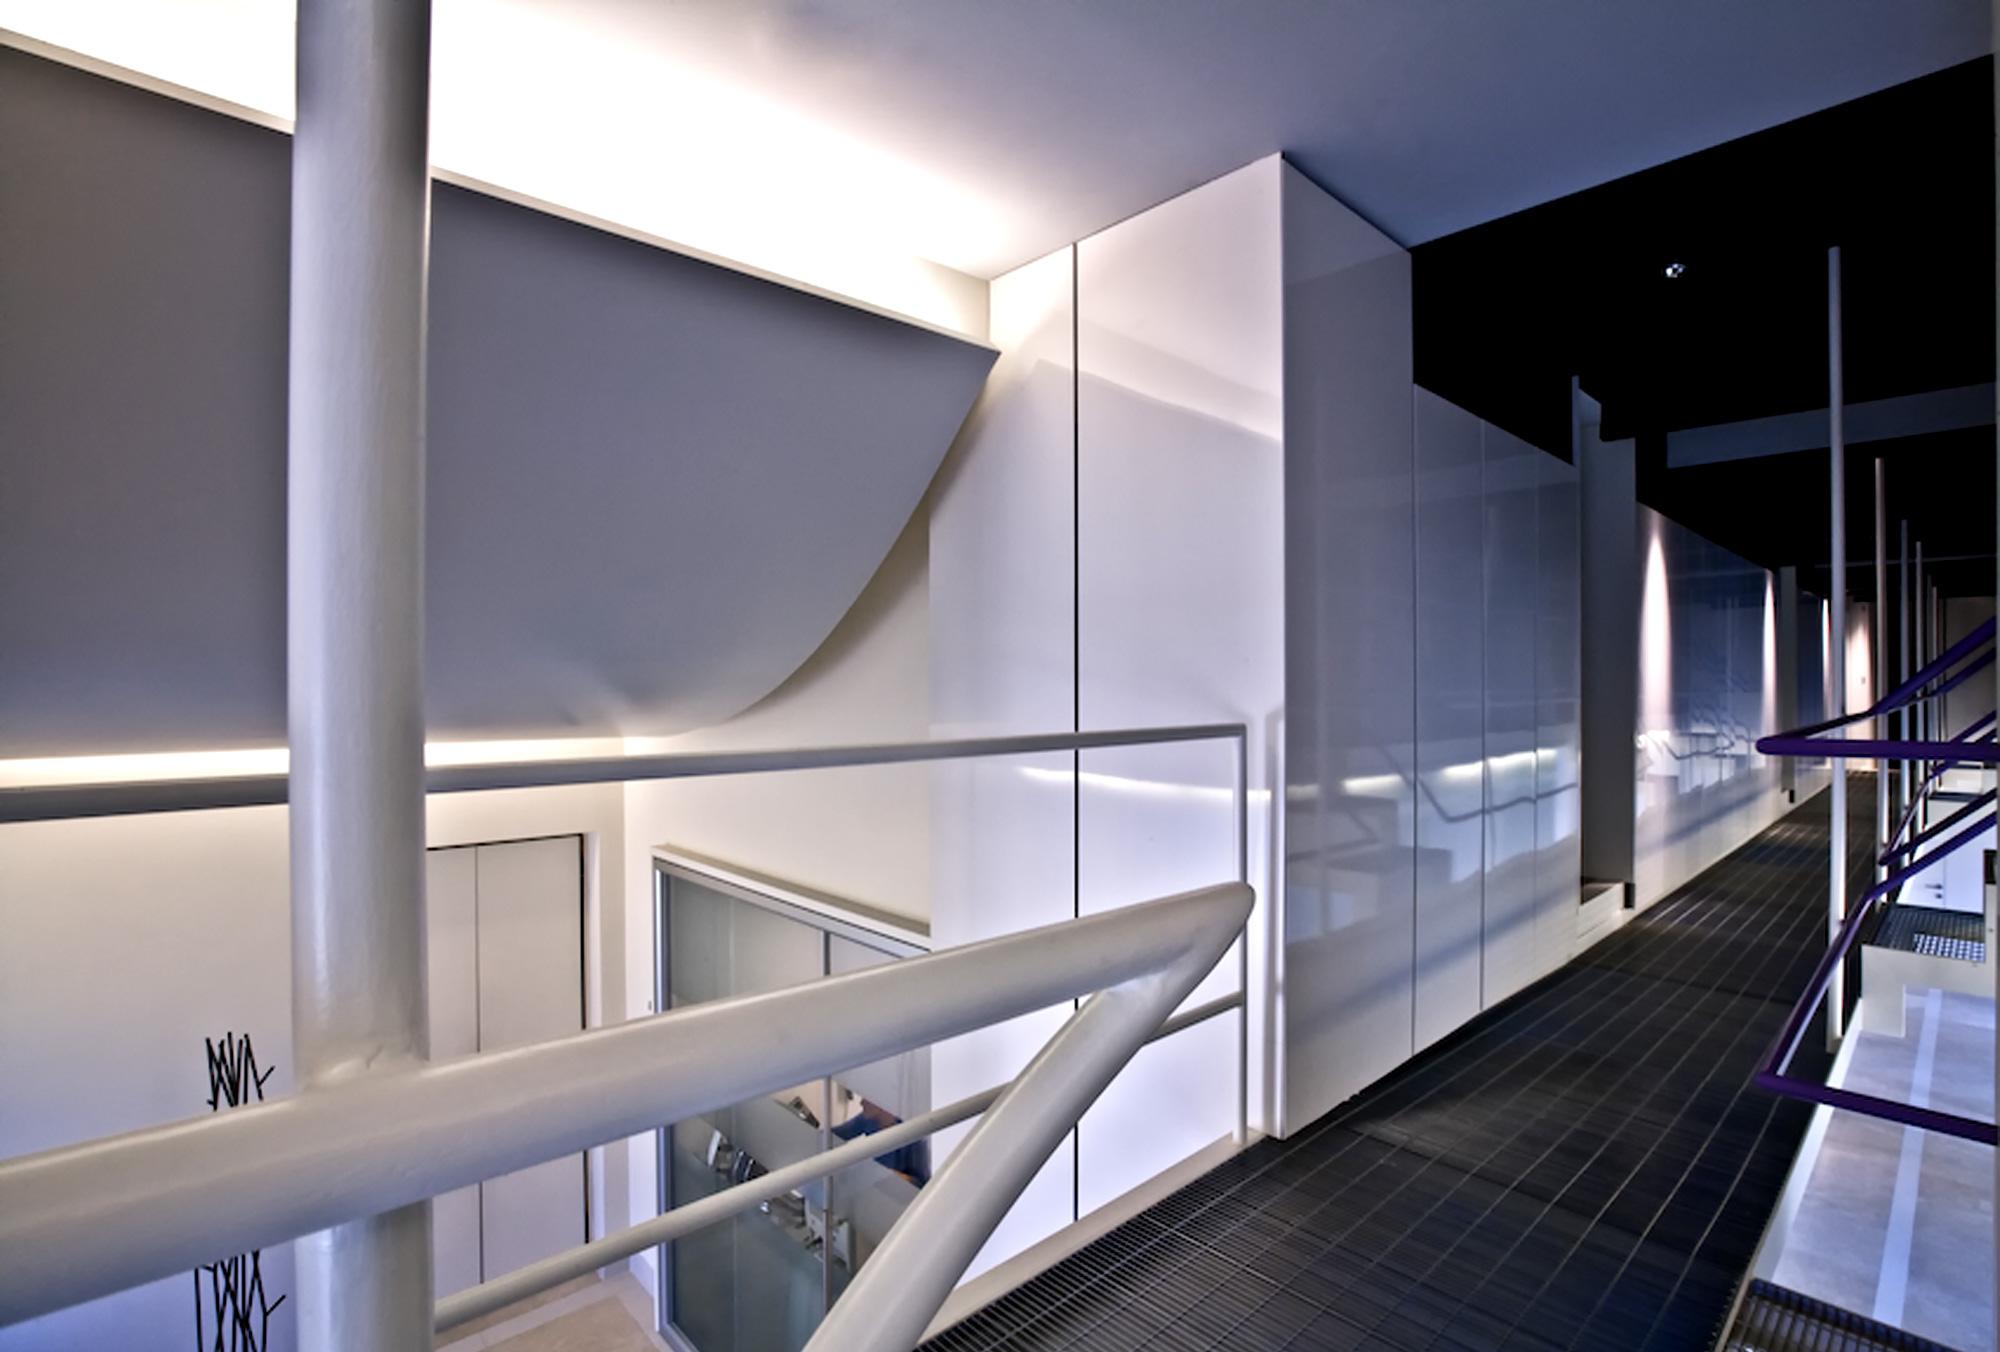 Bevilacqua Architects – Stern&Zanin Office